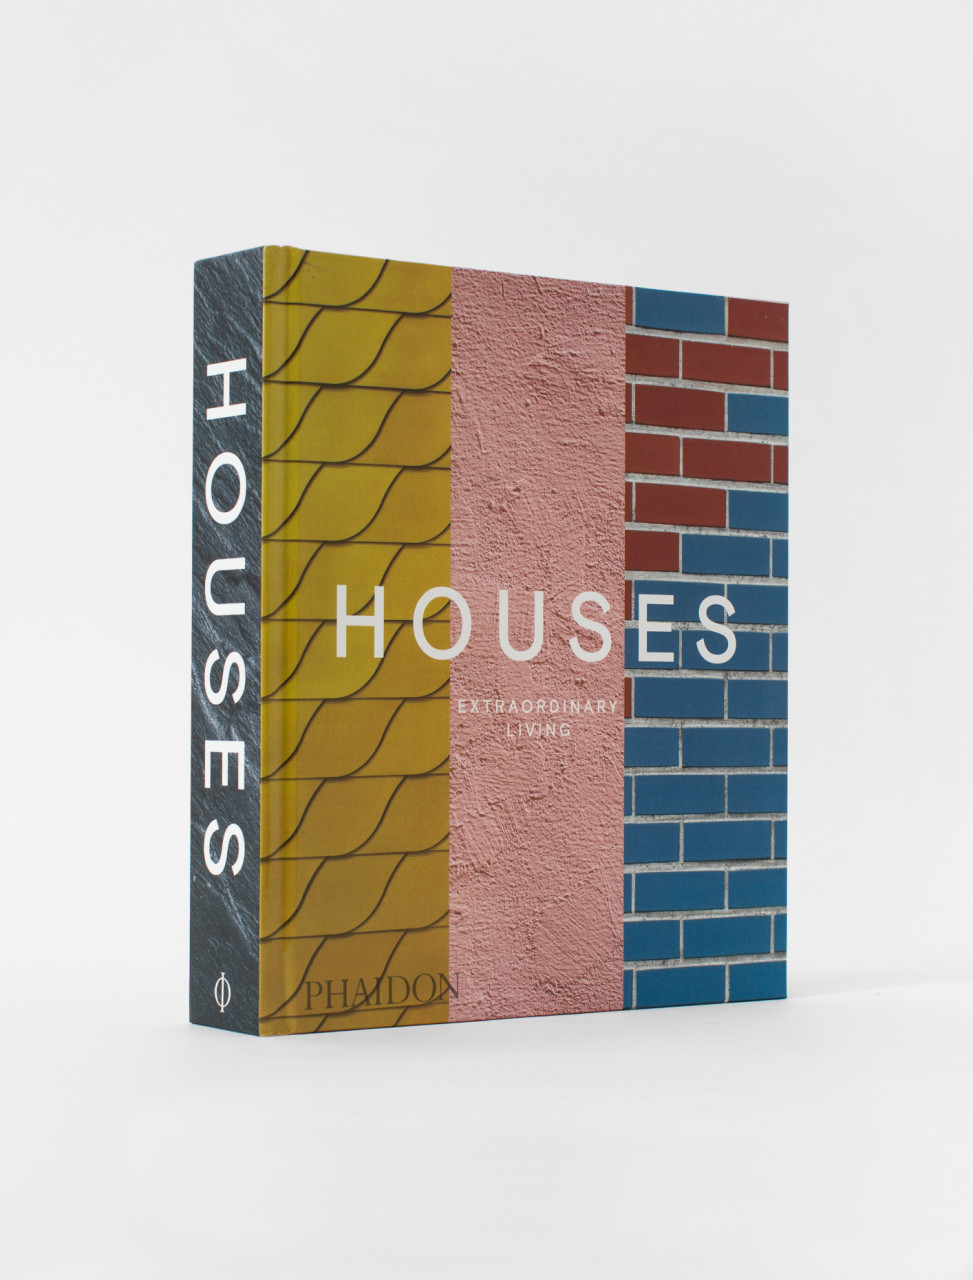 Houses - Extraordinary Living